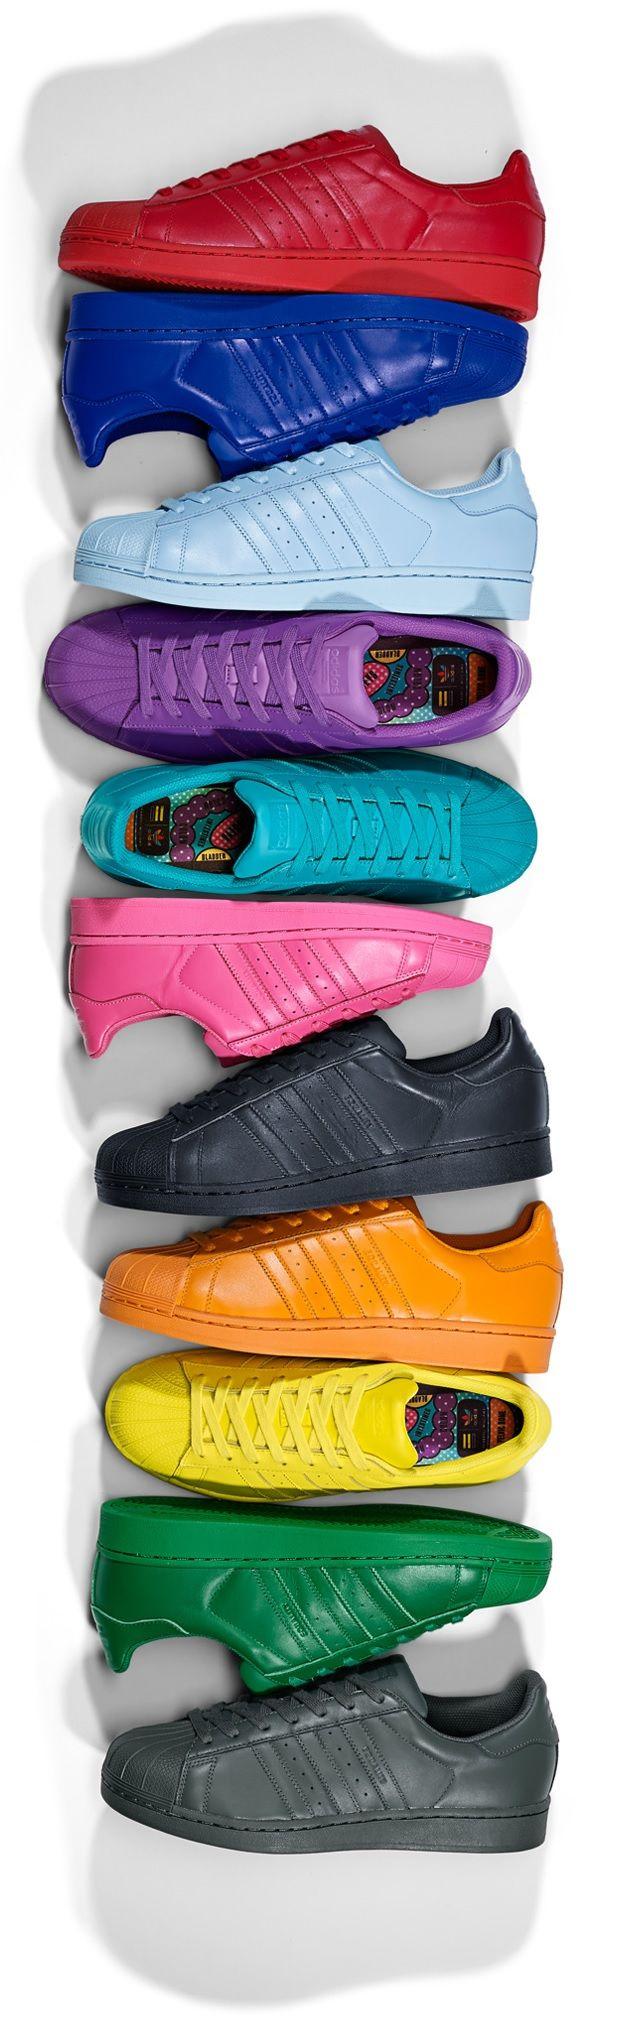 "Pharell Williams x adidas Originals Superstar ""Supercolor Pack""                                                                                                                                                      Más"